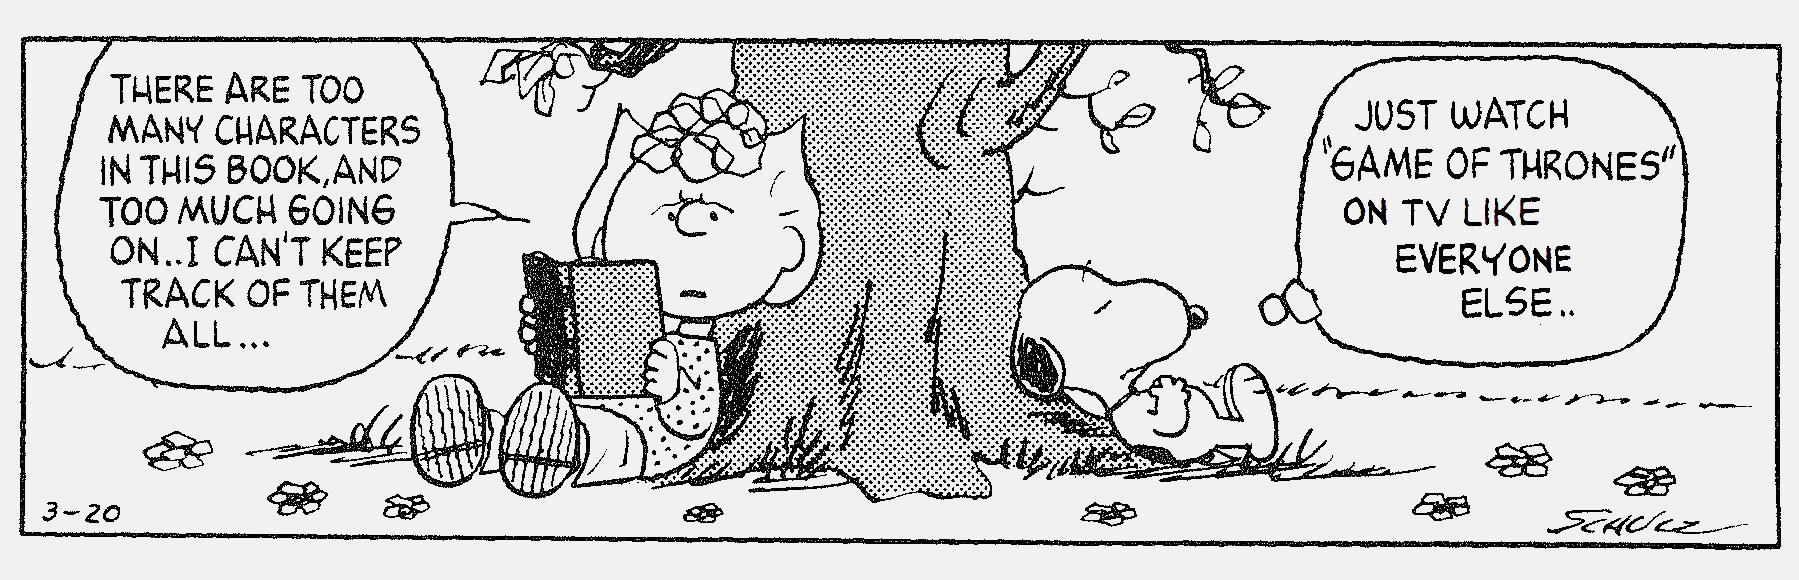 Peanuts-Thrones